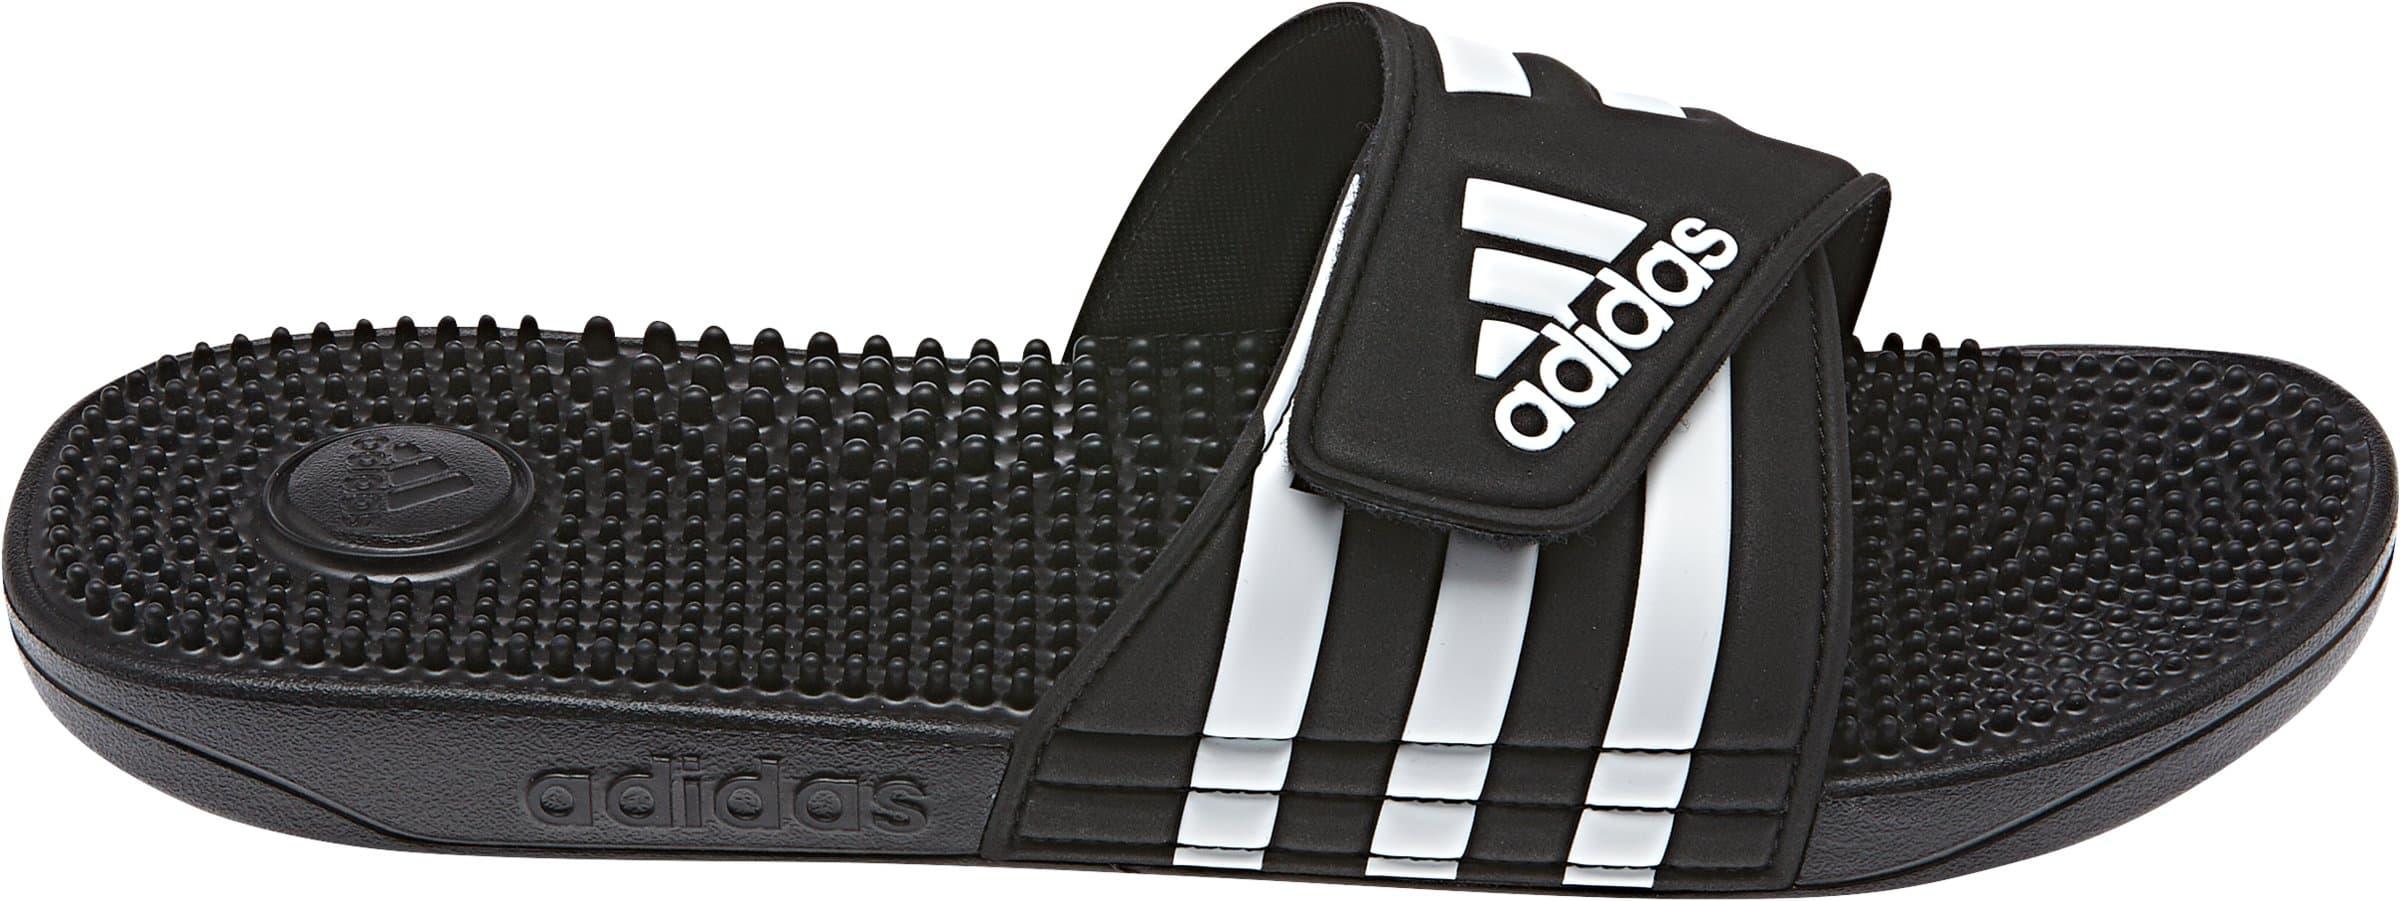 Adidas Adissage Mocassino per uomo